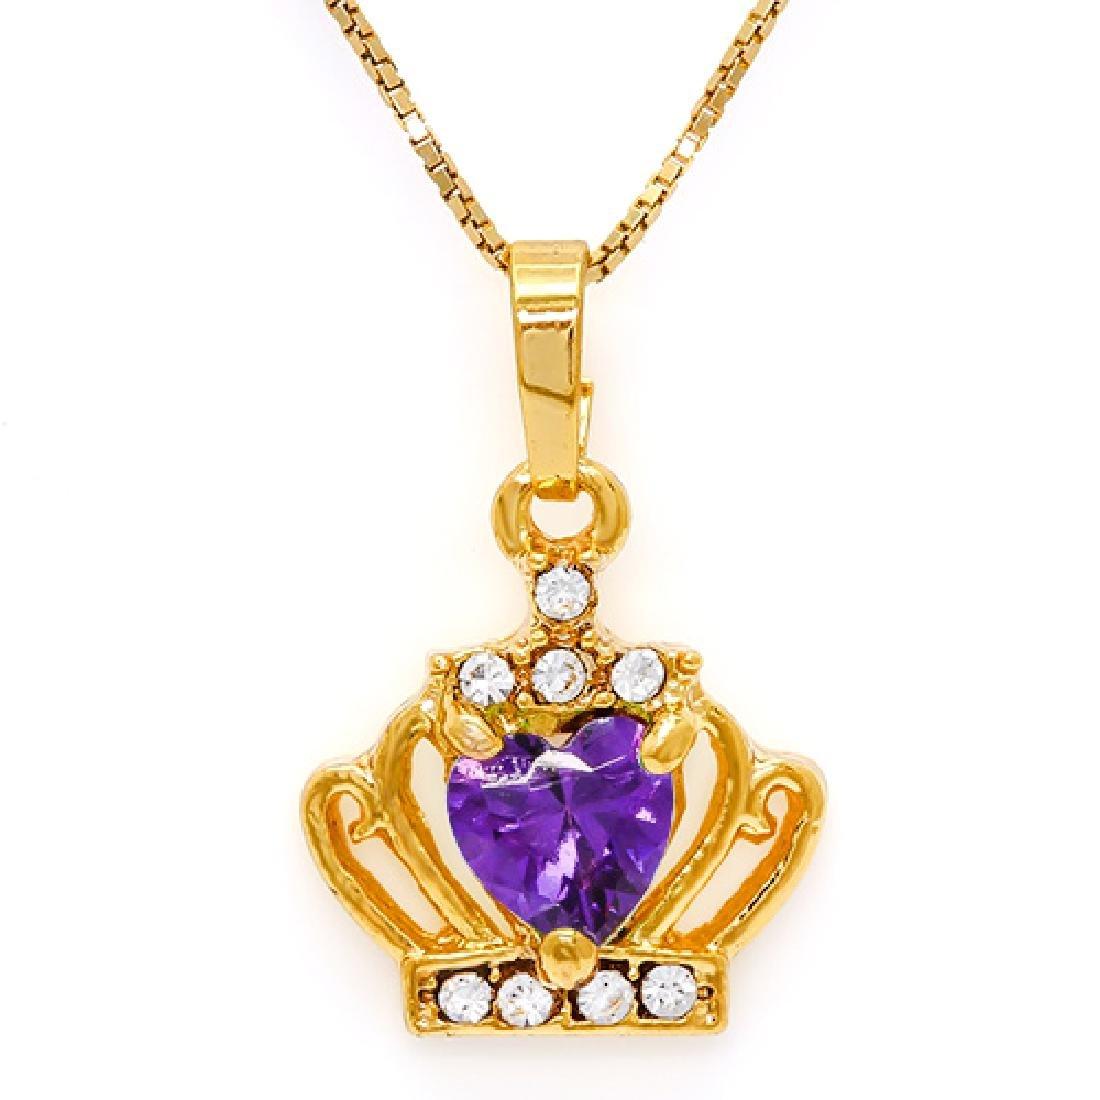 CREATED AMETHYST & FLAWLESS CREATED DIAMOND 18K GOLD PL